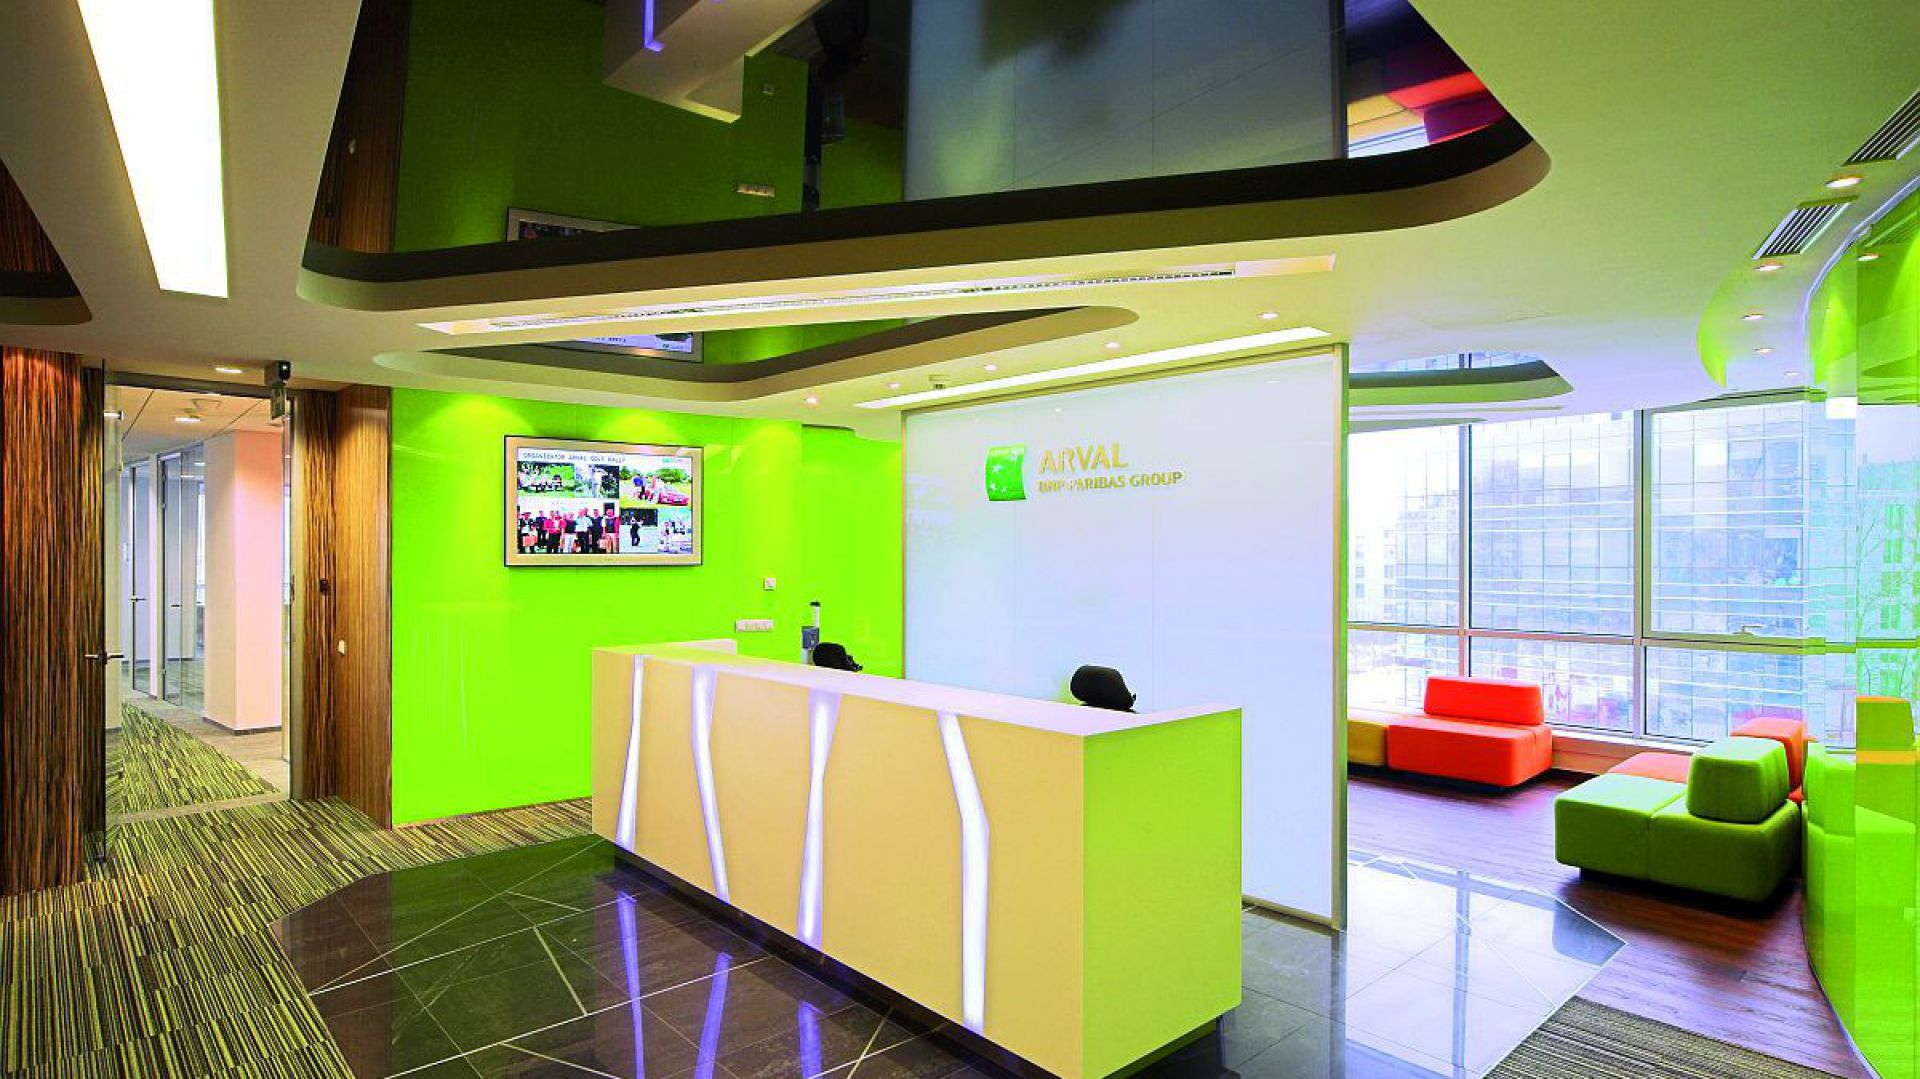 1_Arval (BNP Paribas Group) designed by Massive Design.jpg